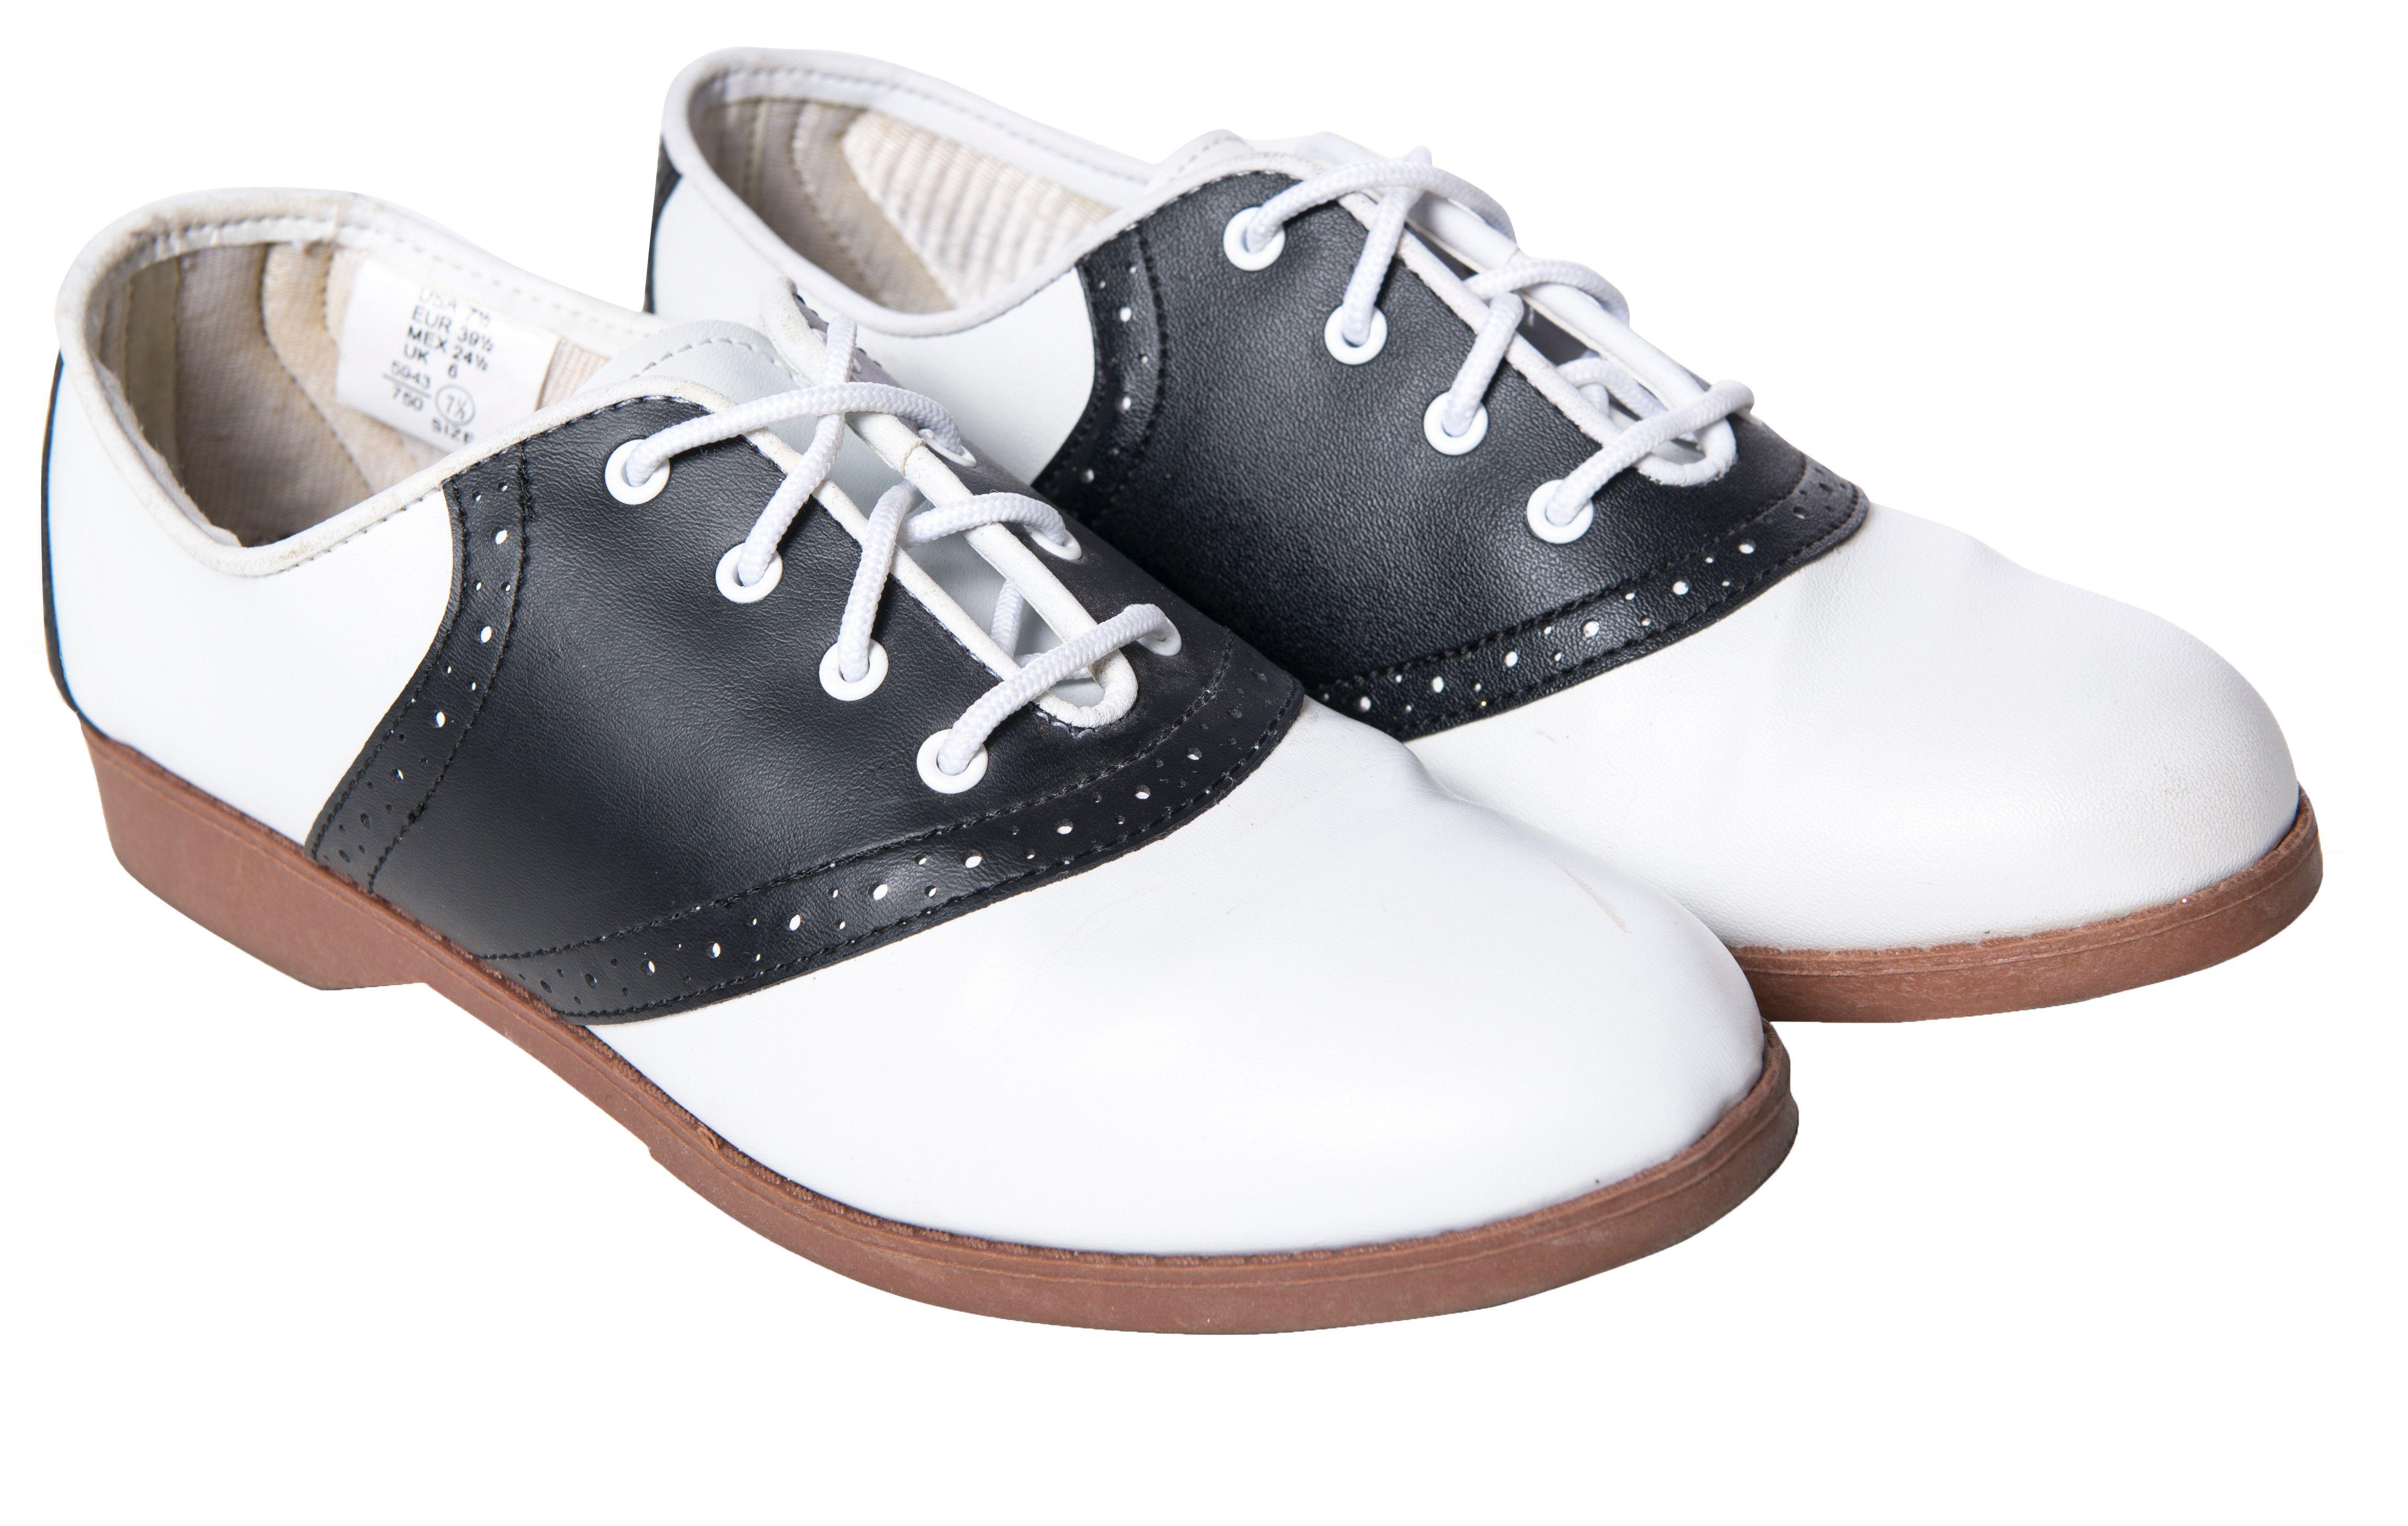 86060871b2856 Image result for saddle shoes Saddle Oxford Shoes, Sock Hop, Halloween  Accessories, Hip